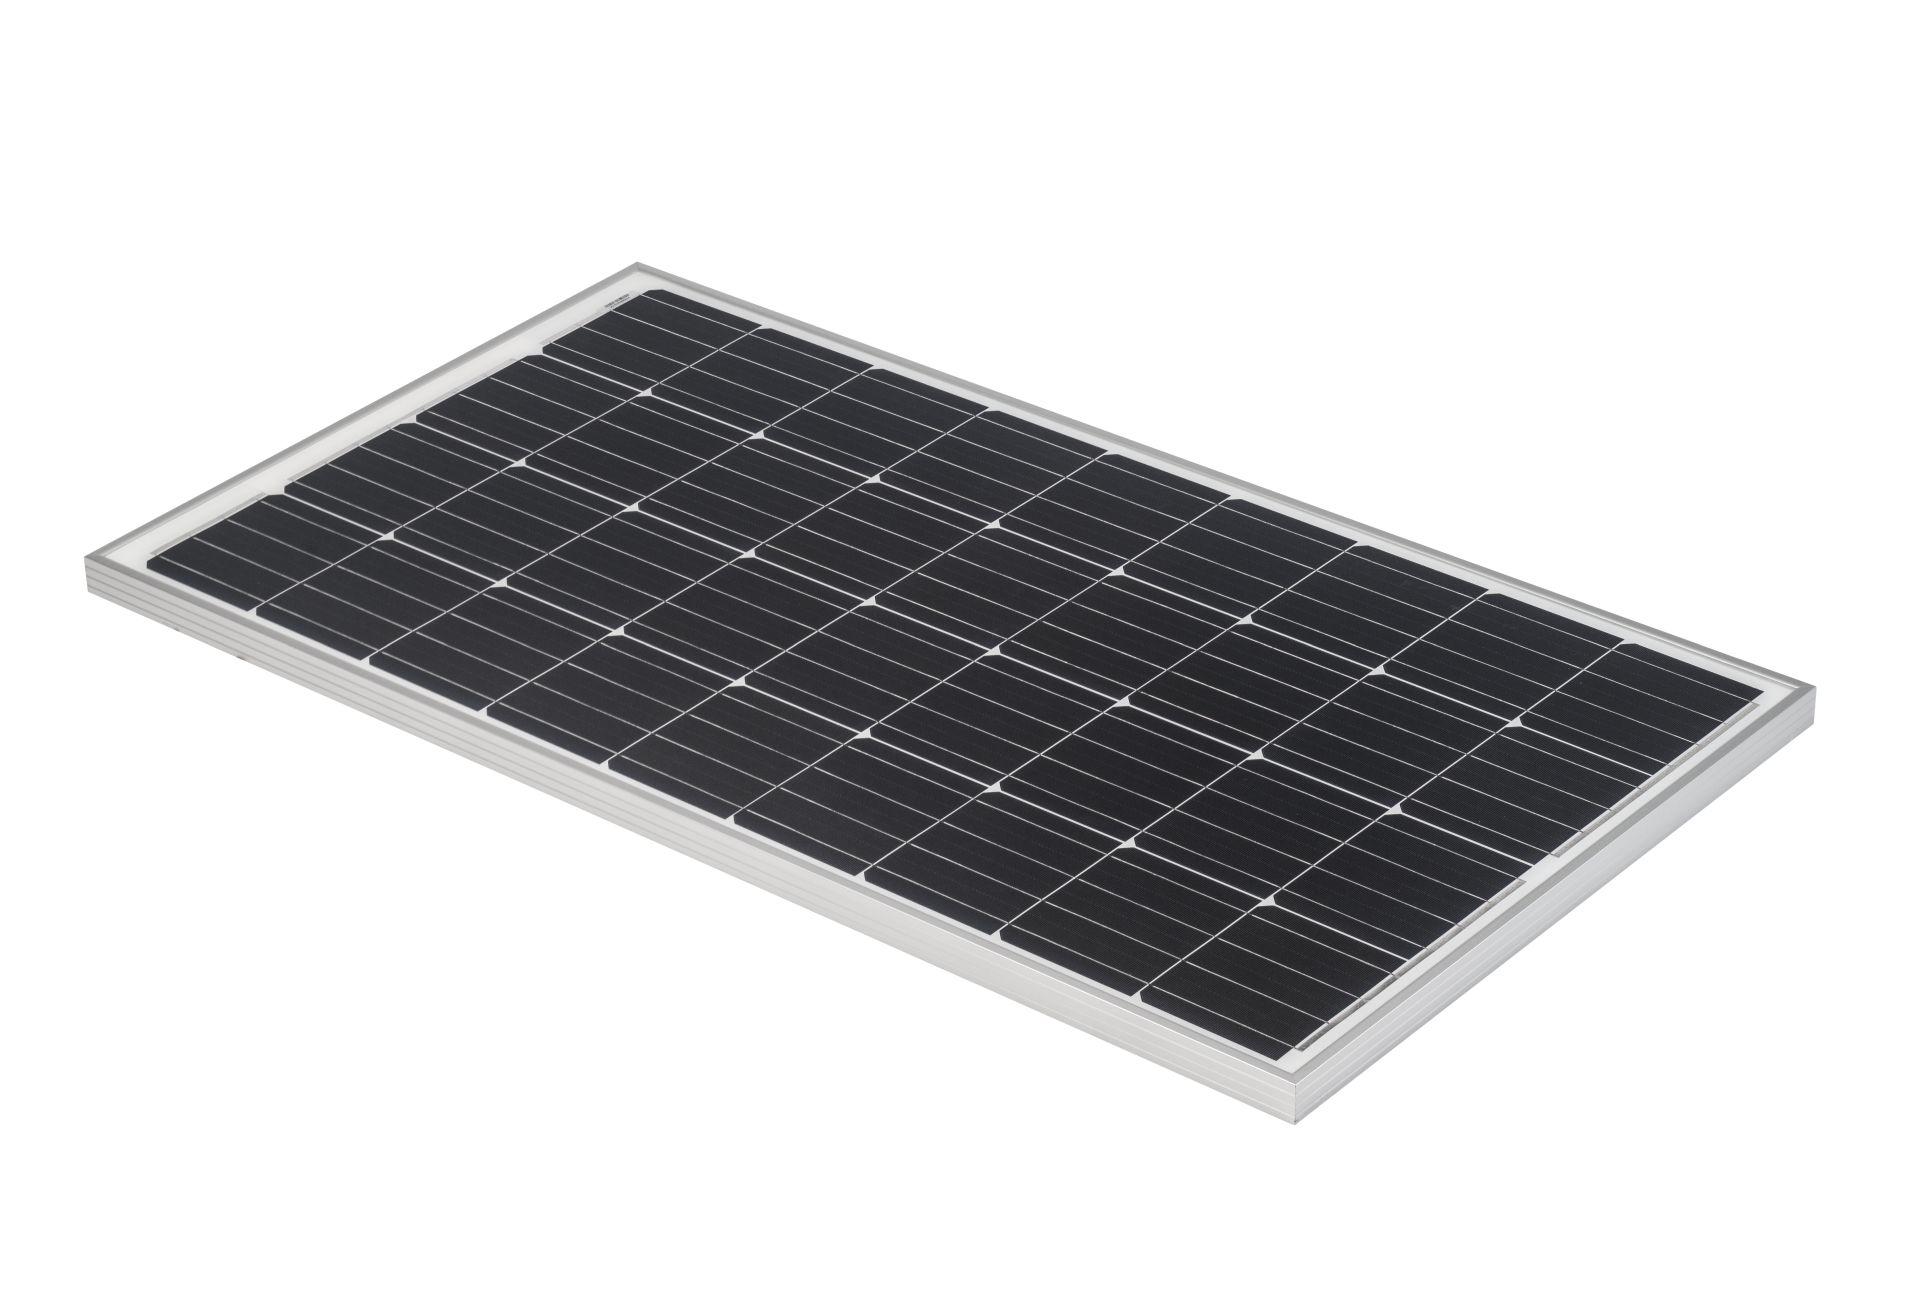 solarmodul 130w 12v monokristallin wohnmobil 4 busbars. Black Bedroom Furniture Sets. Home Design Ideas